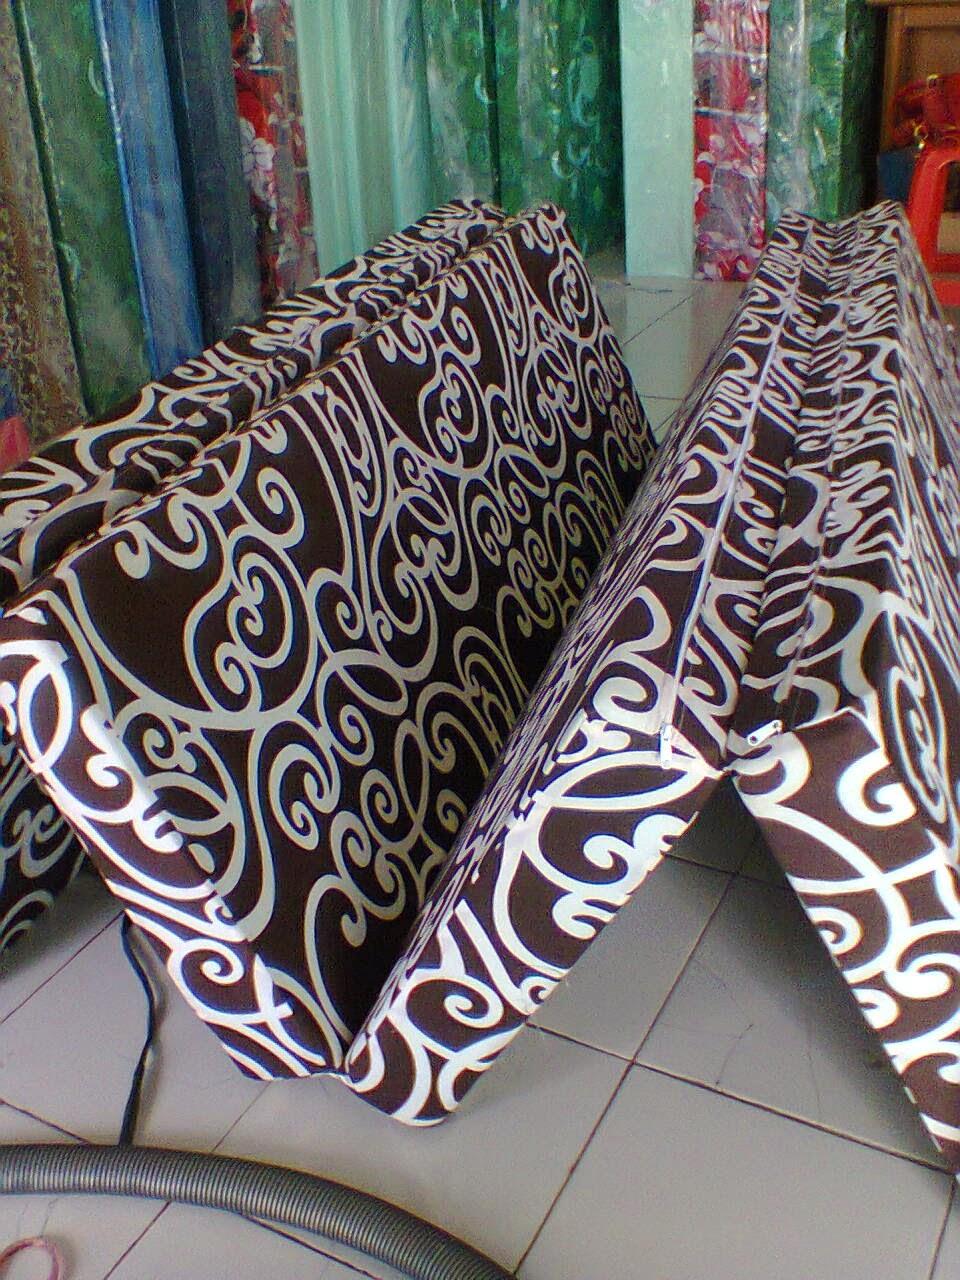 Sofa Bed Kasur Busa Lipat Inoac Jakarta Dfs Brown Leather Daftar Harga Bekasi Distributor